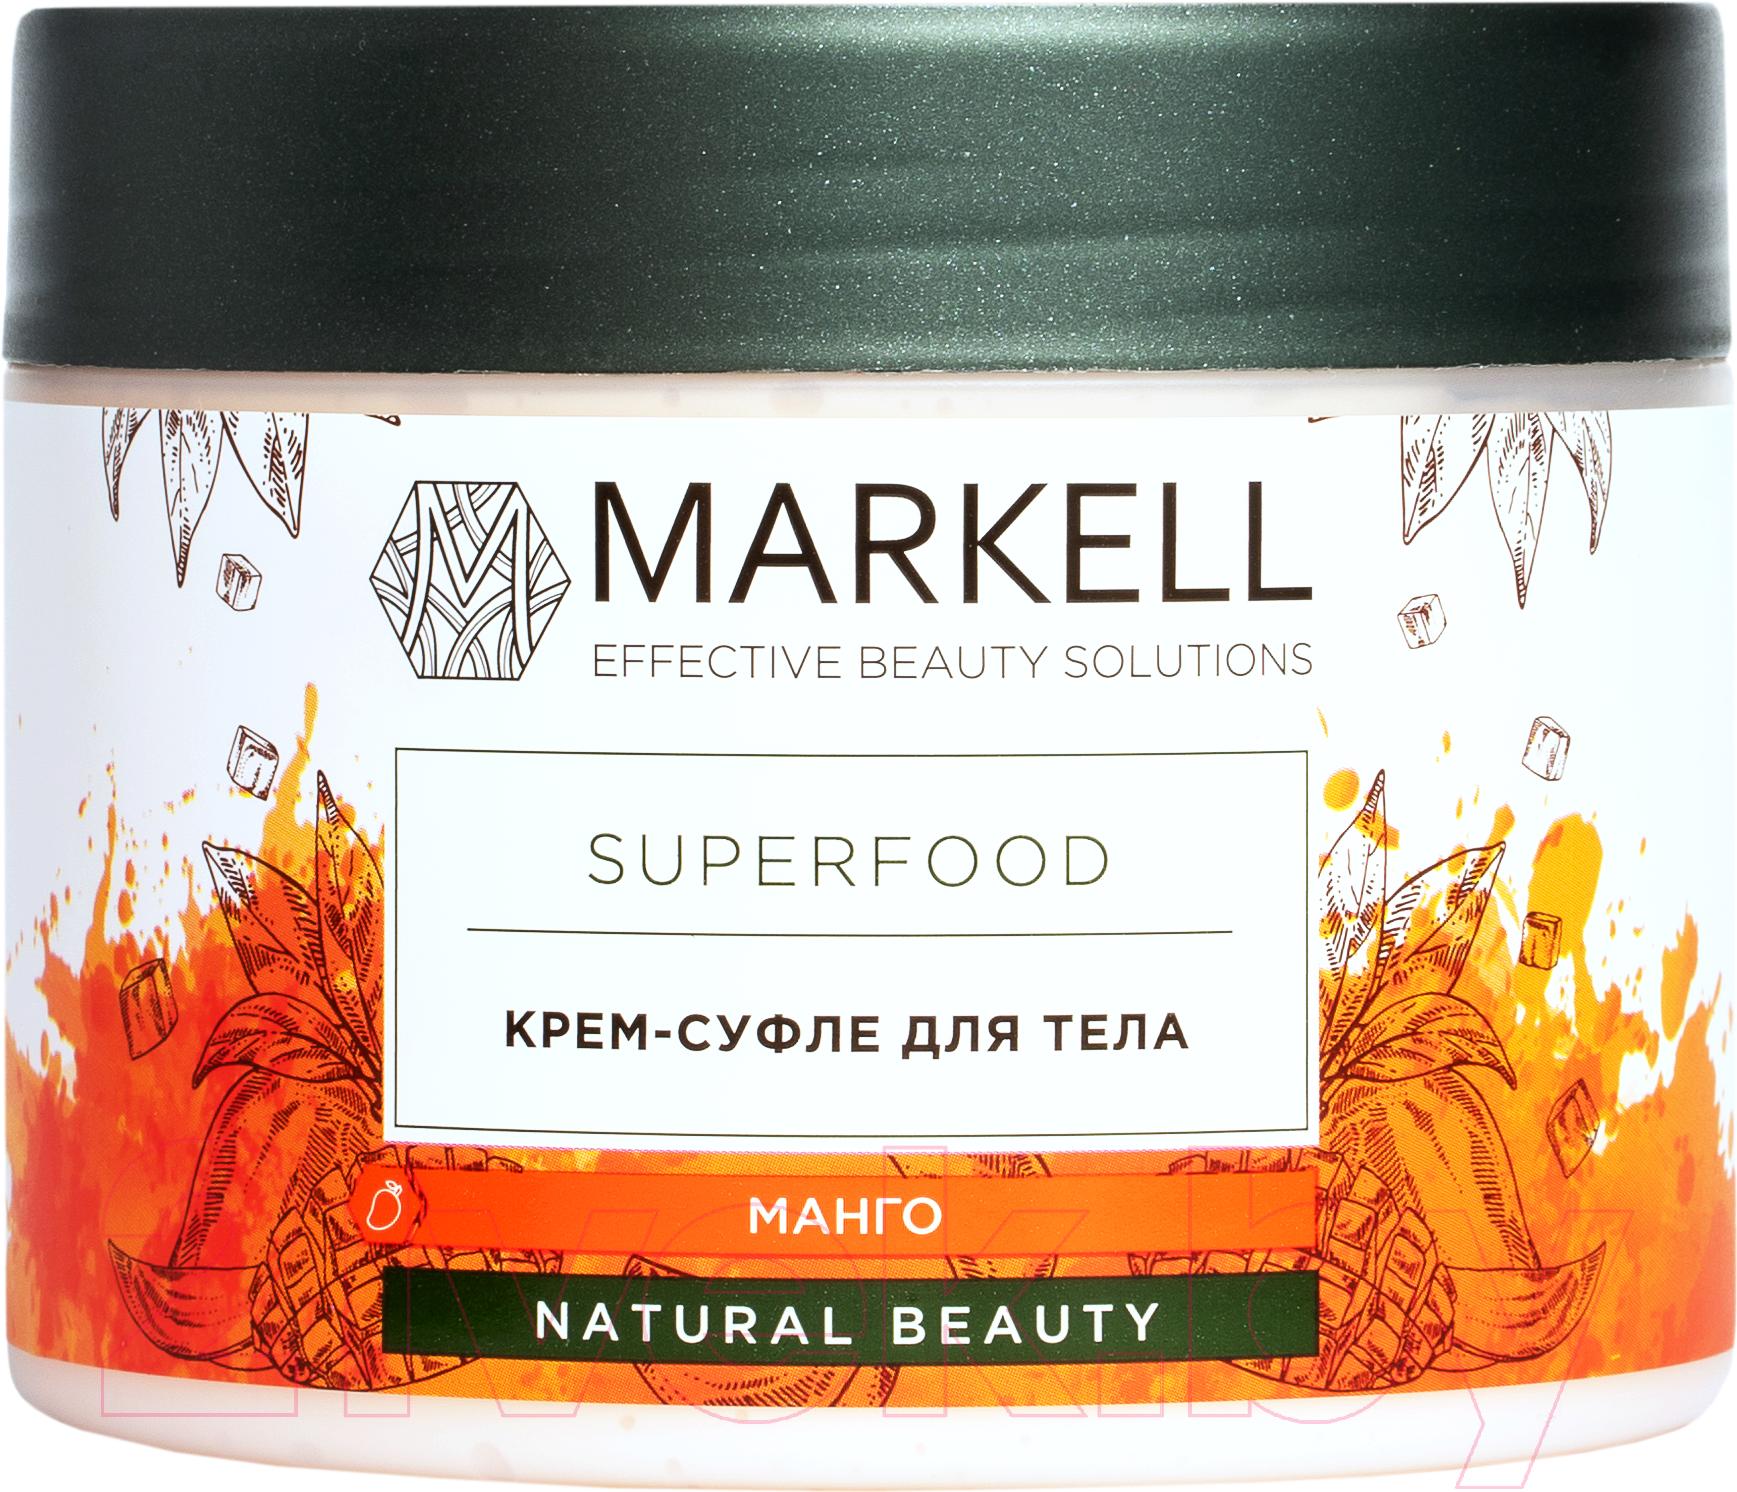 Купить Крем для тела Markell, Superfood манго (300мл), Беларусь